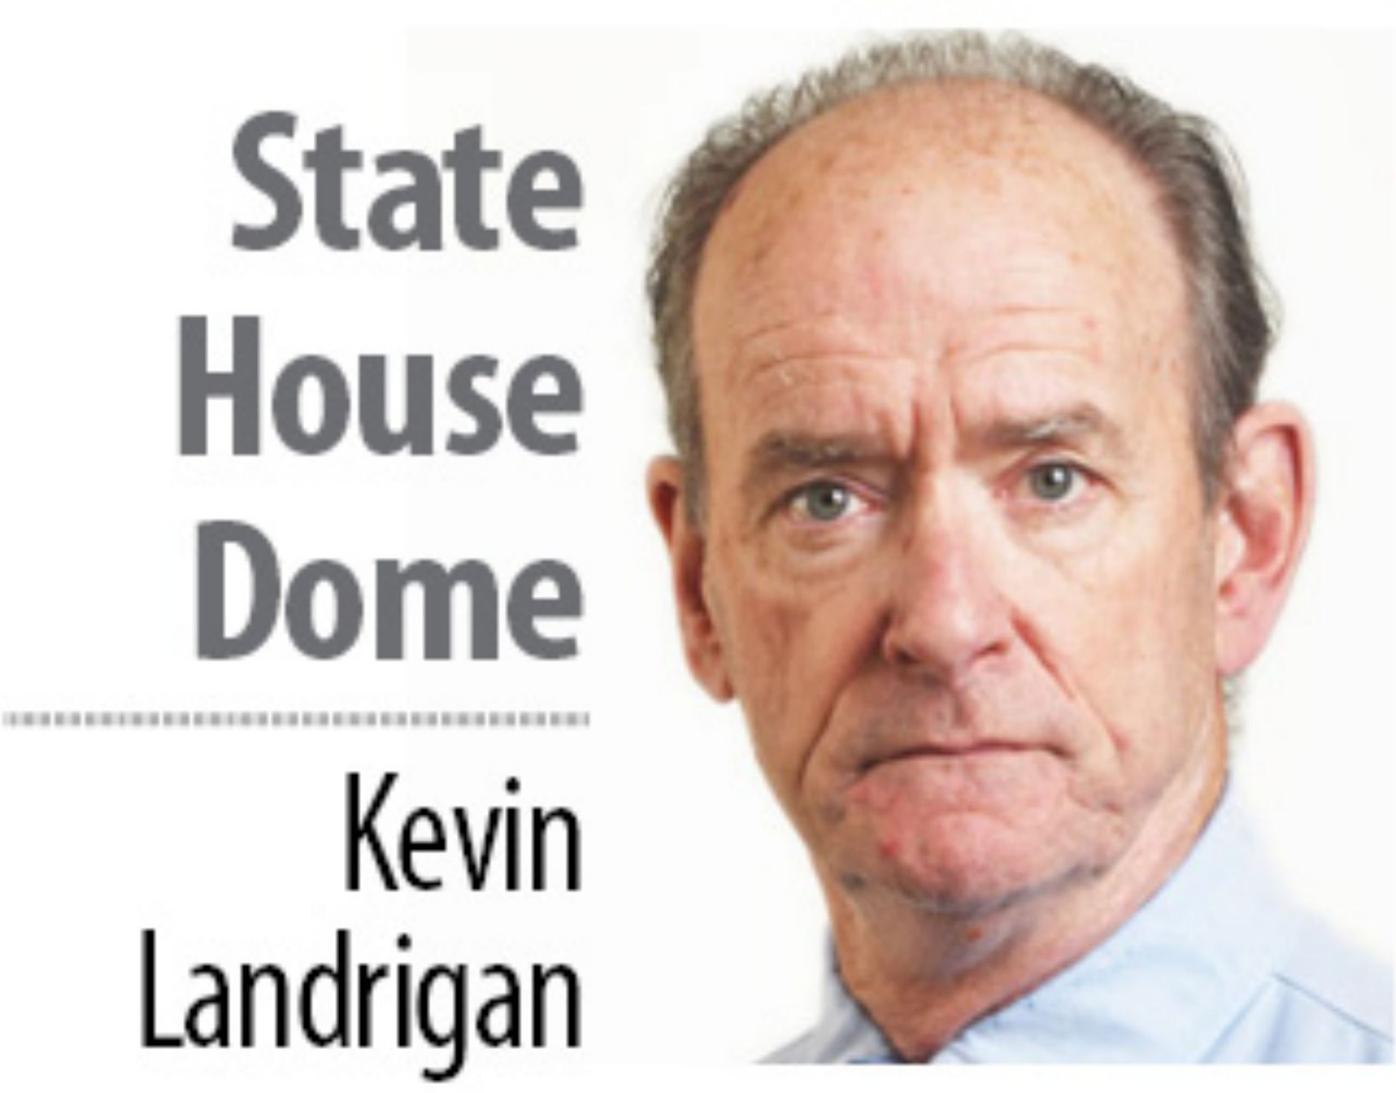 Kevin Landrigan Dome